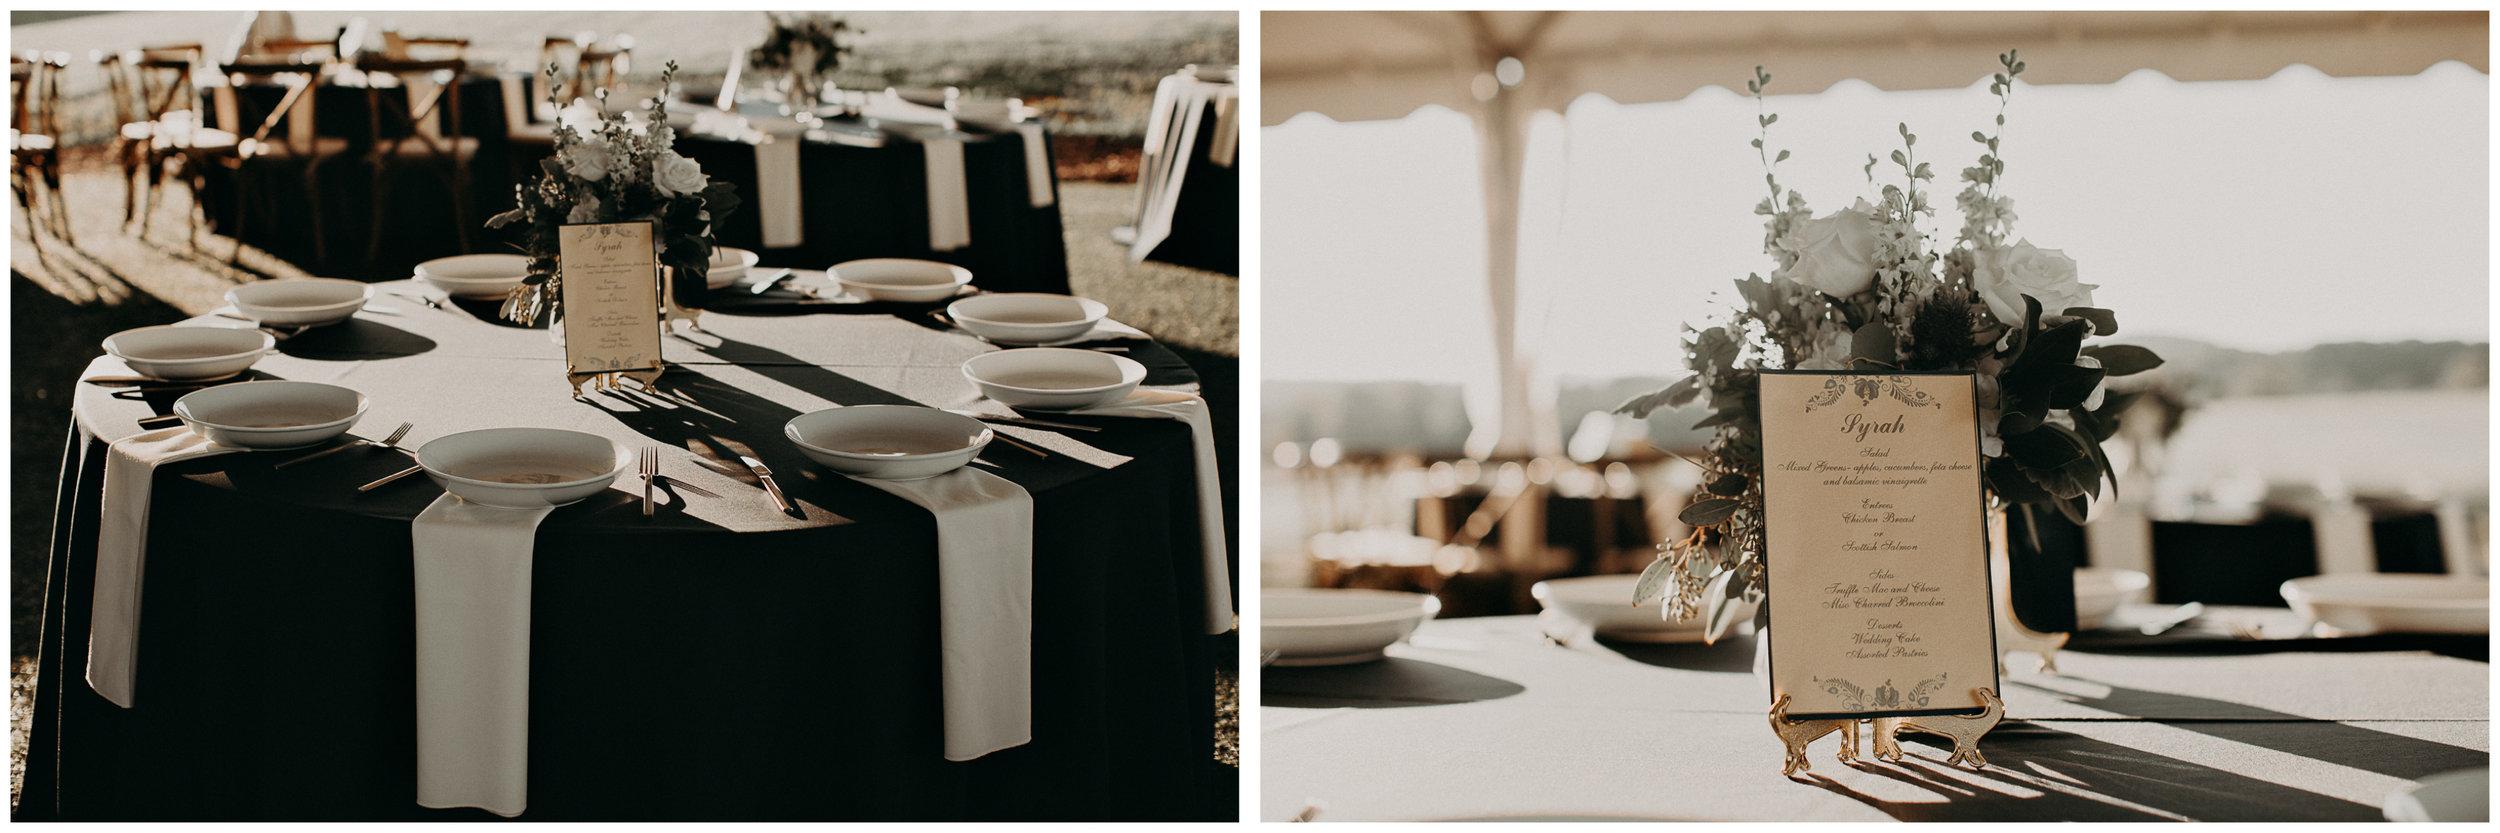 61- Kaya_vineyard_dahlonega_wedding_venue_details_decor_aline_marin_photography.jpg